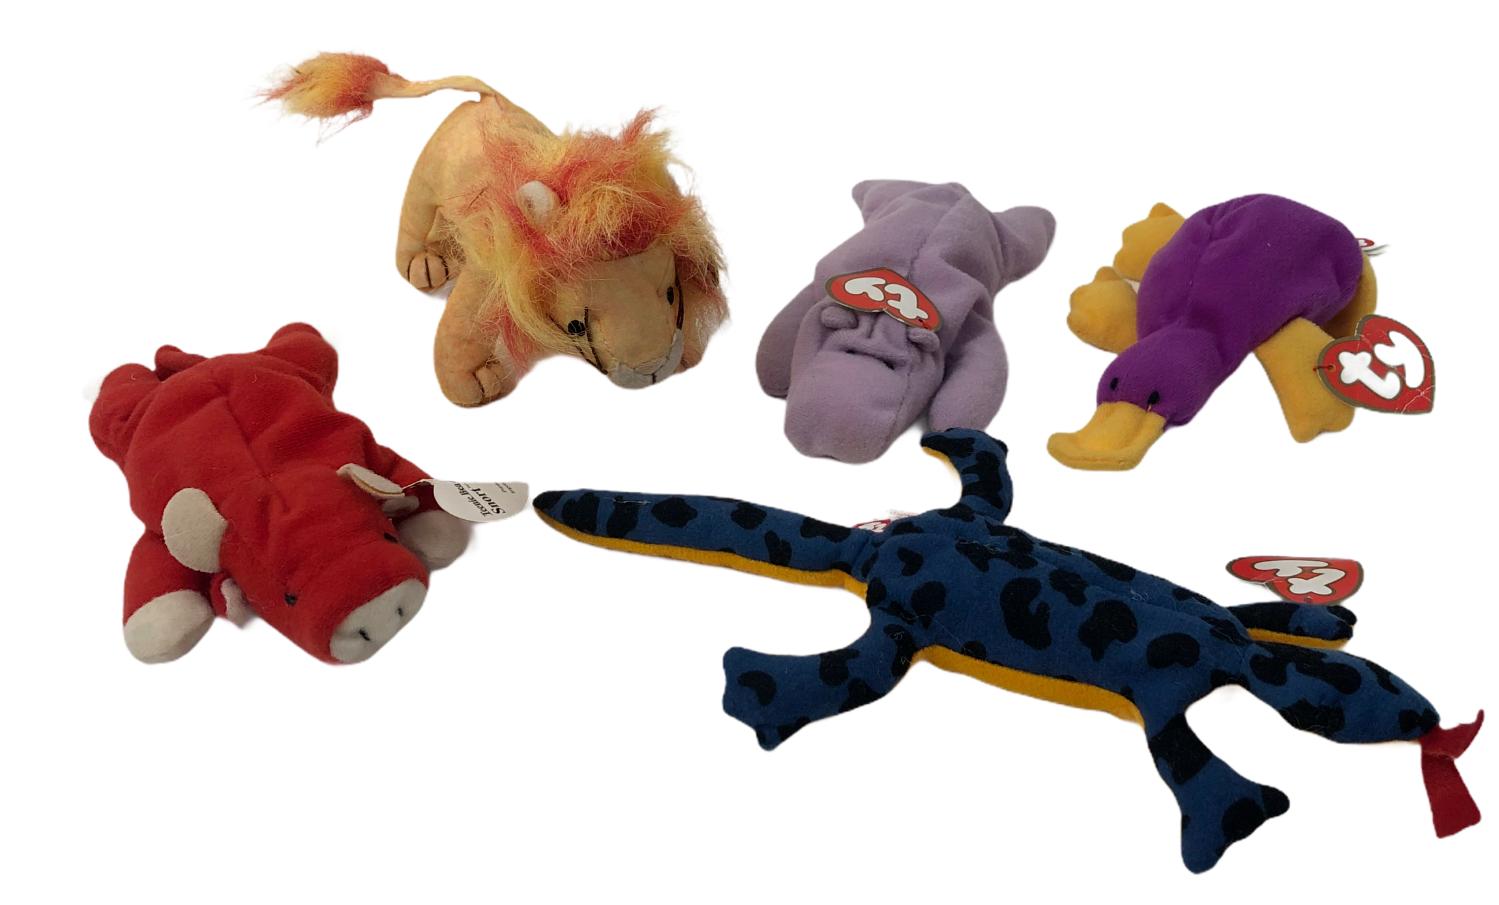 Ty Teenie Beanie Babies Lot of 5 Plush Stuffed Animal Toys - $30.00